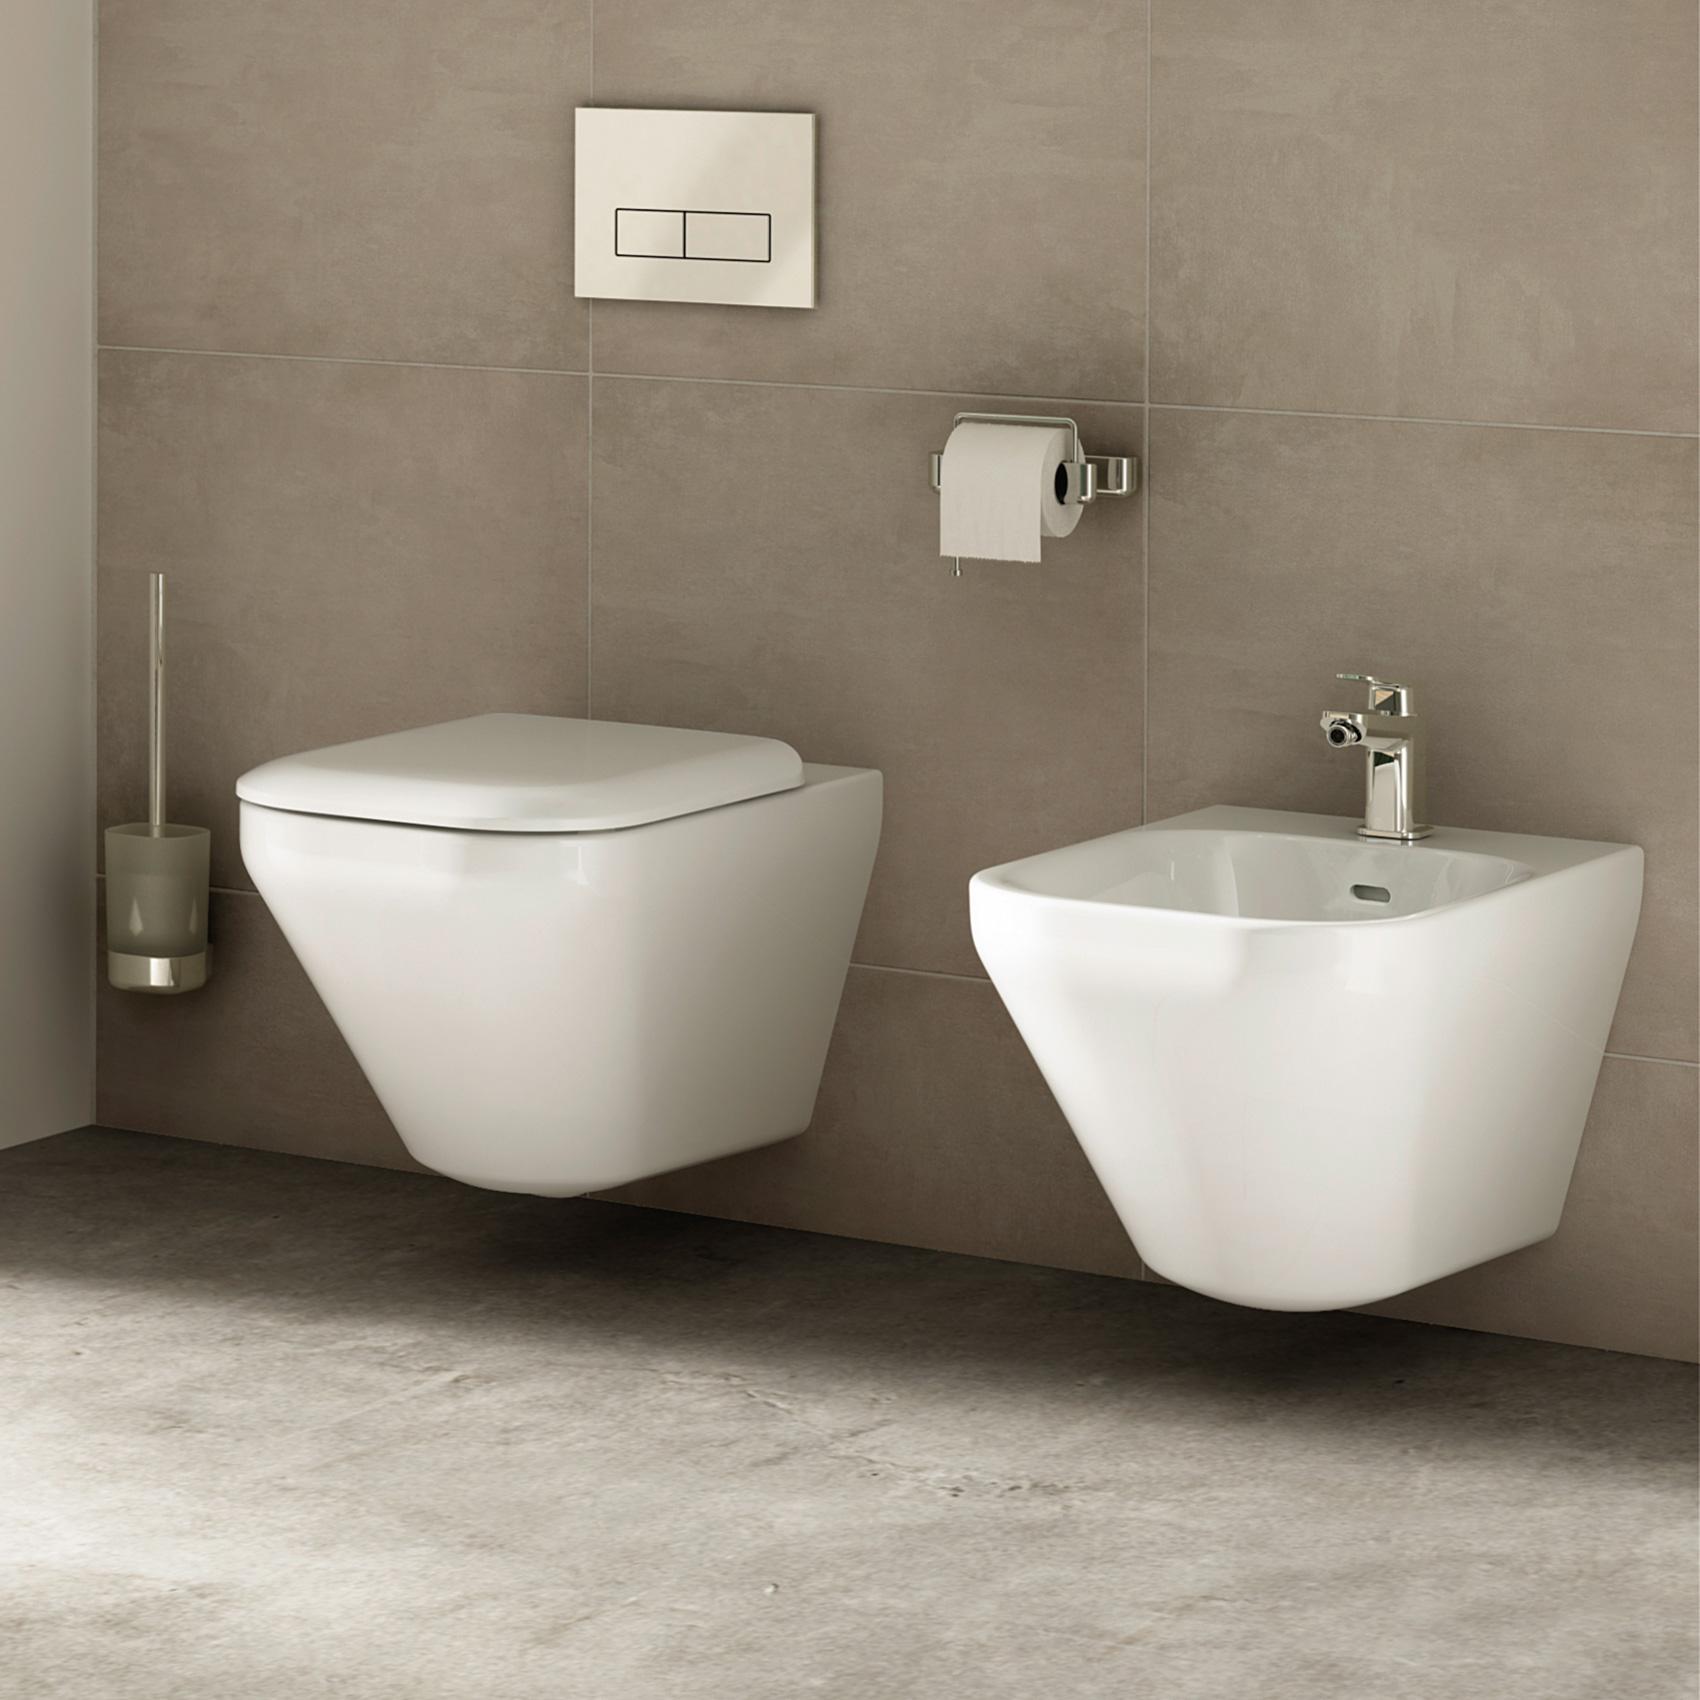 ideal standard tonic ii wandtiefsp lklosett sp lrandlos l 56 5 b 36 cm wei k316301 reuter. Black Bedroom Furniture Sets. Home Design Ideas